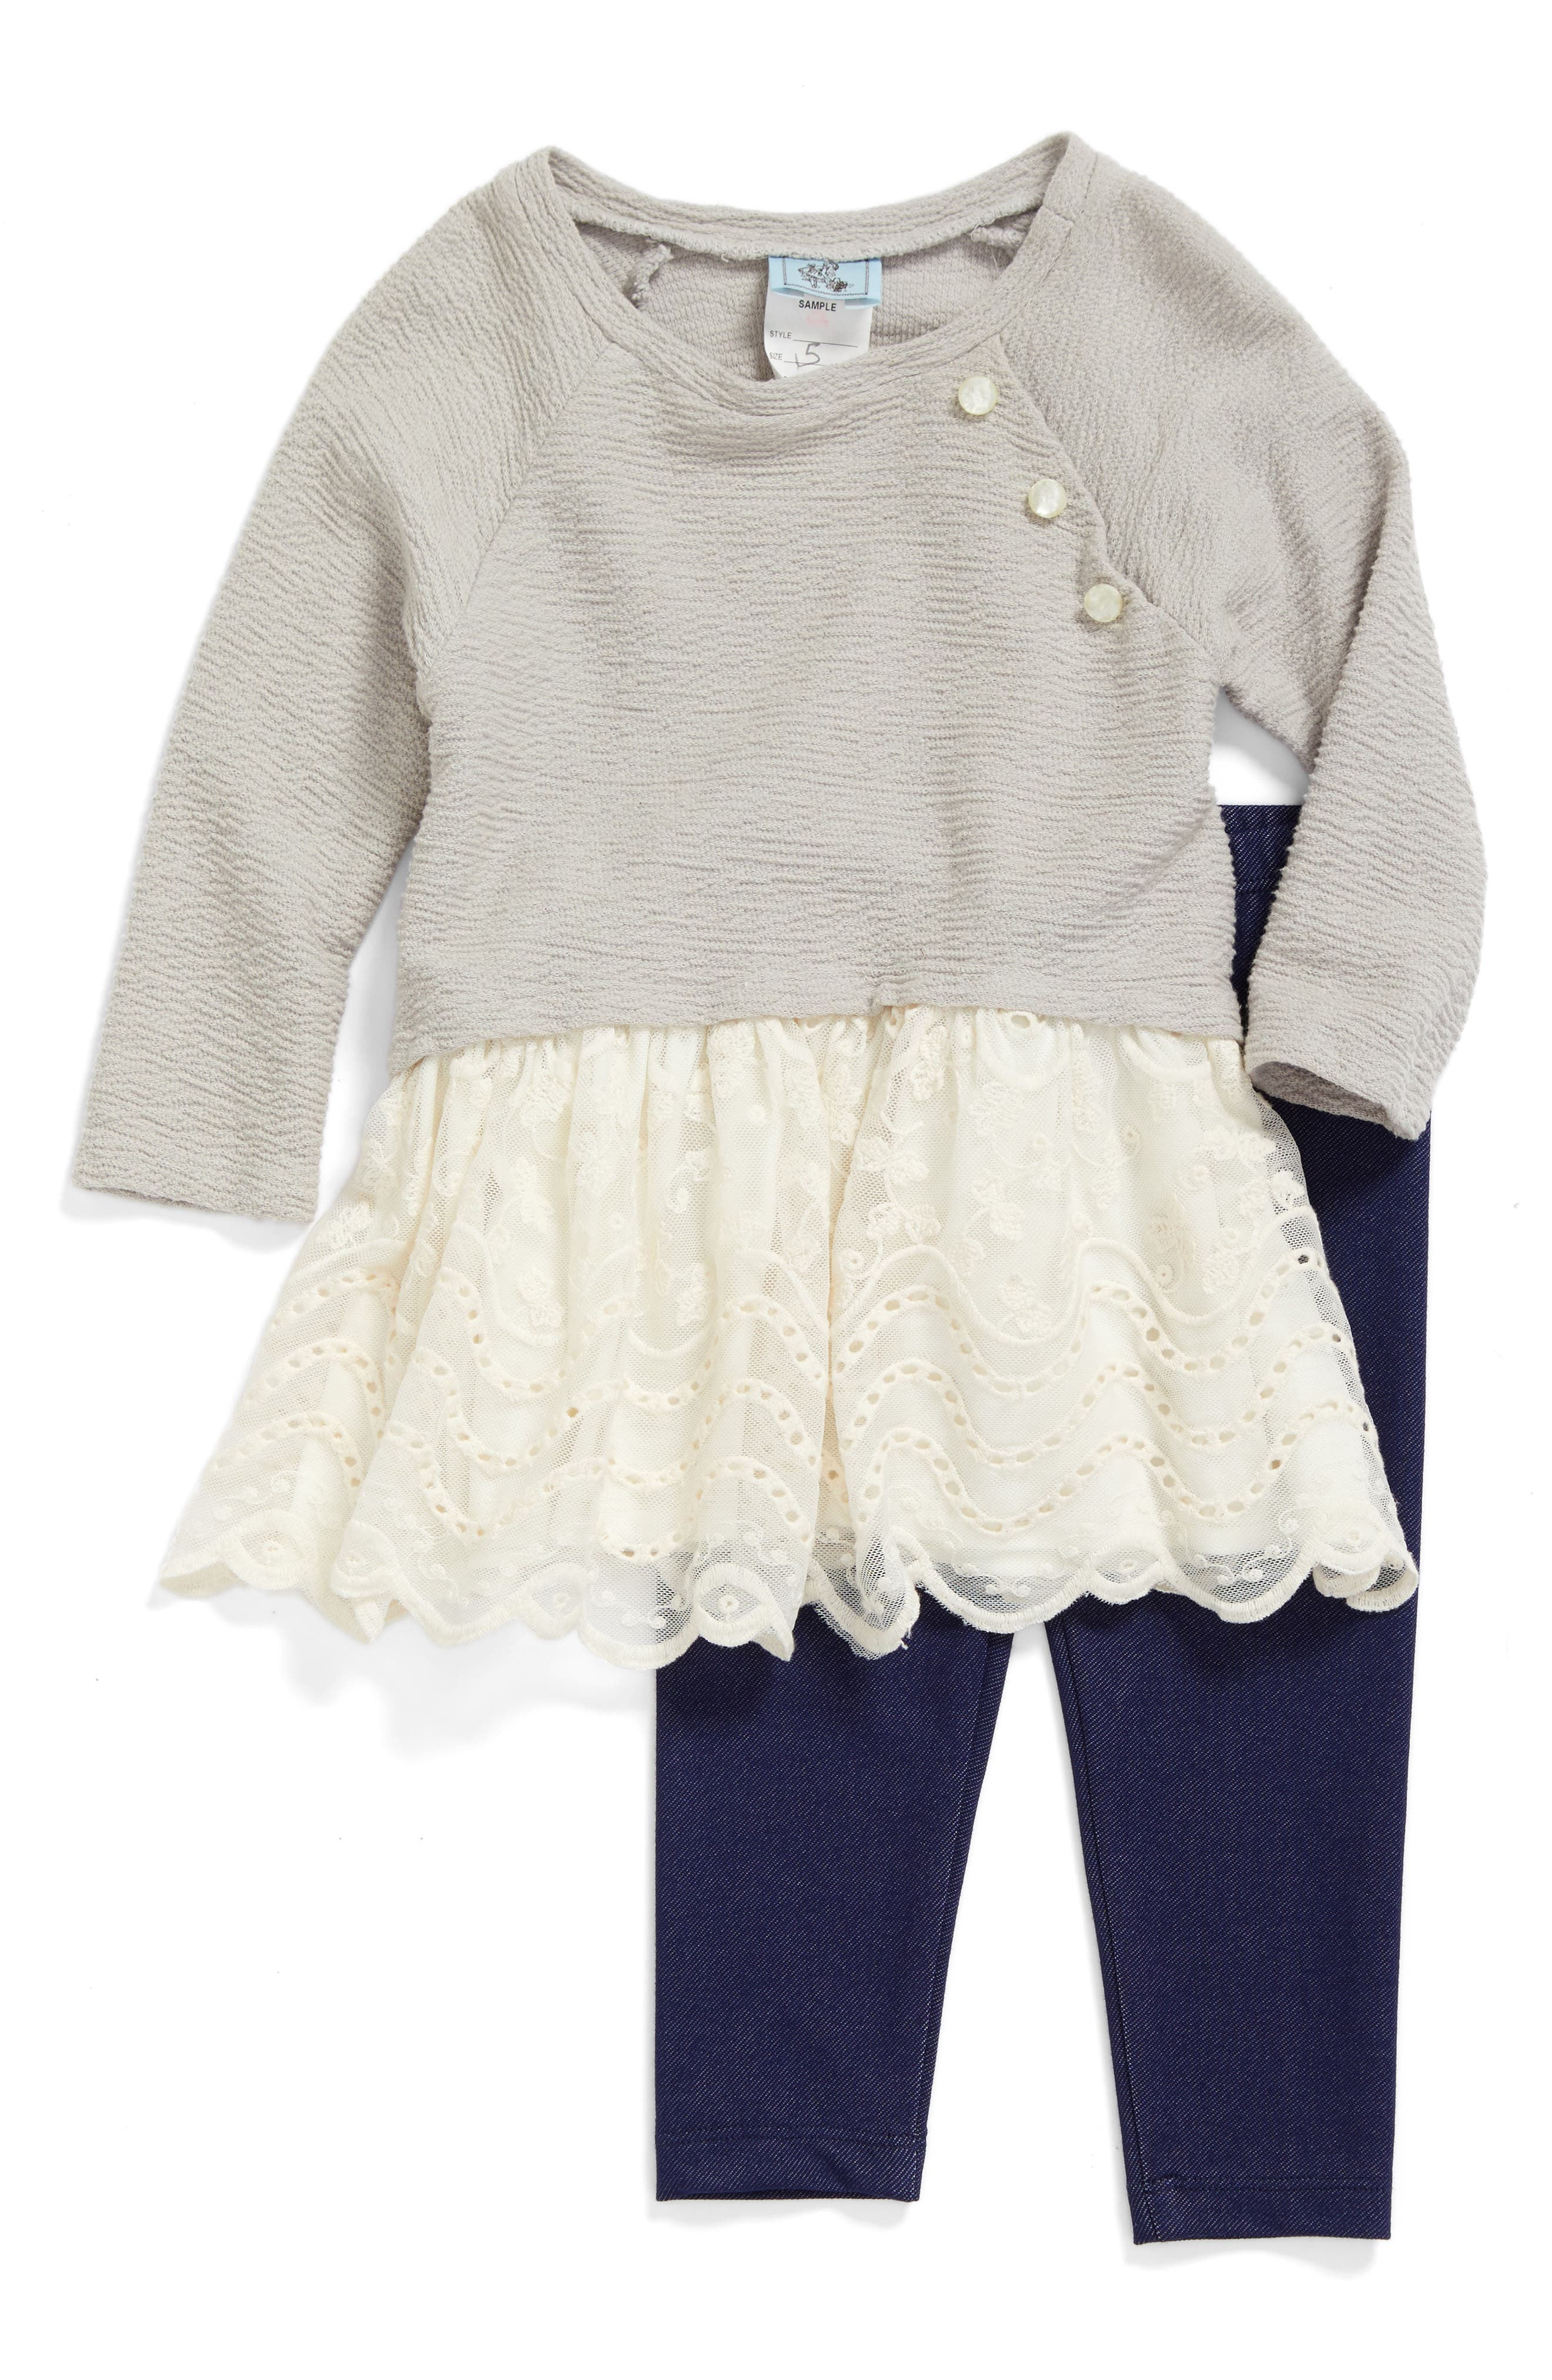 Lace Peplum Top & Leggings Set,                         Main,                         color, Light Grey